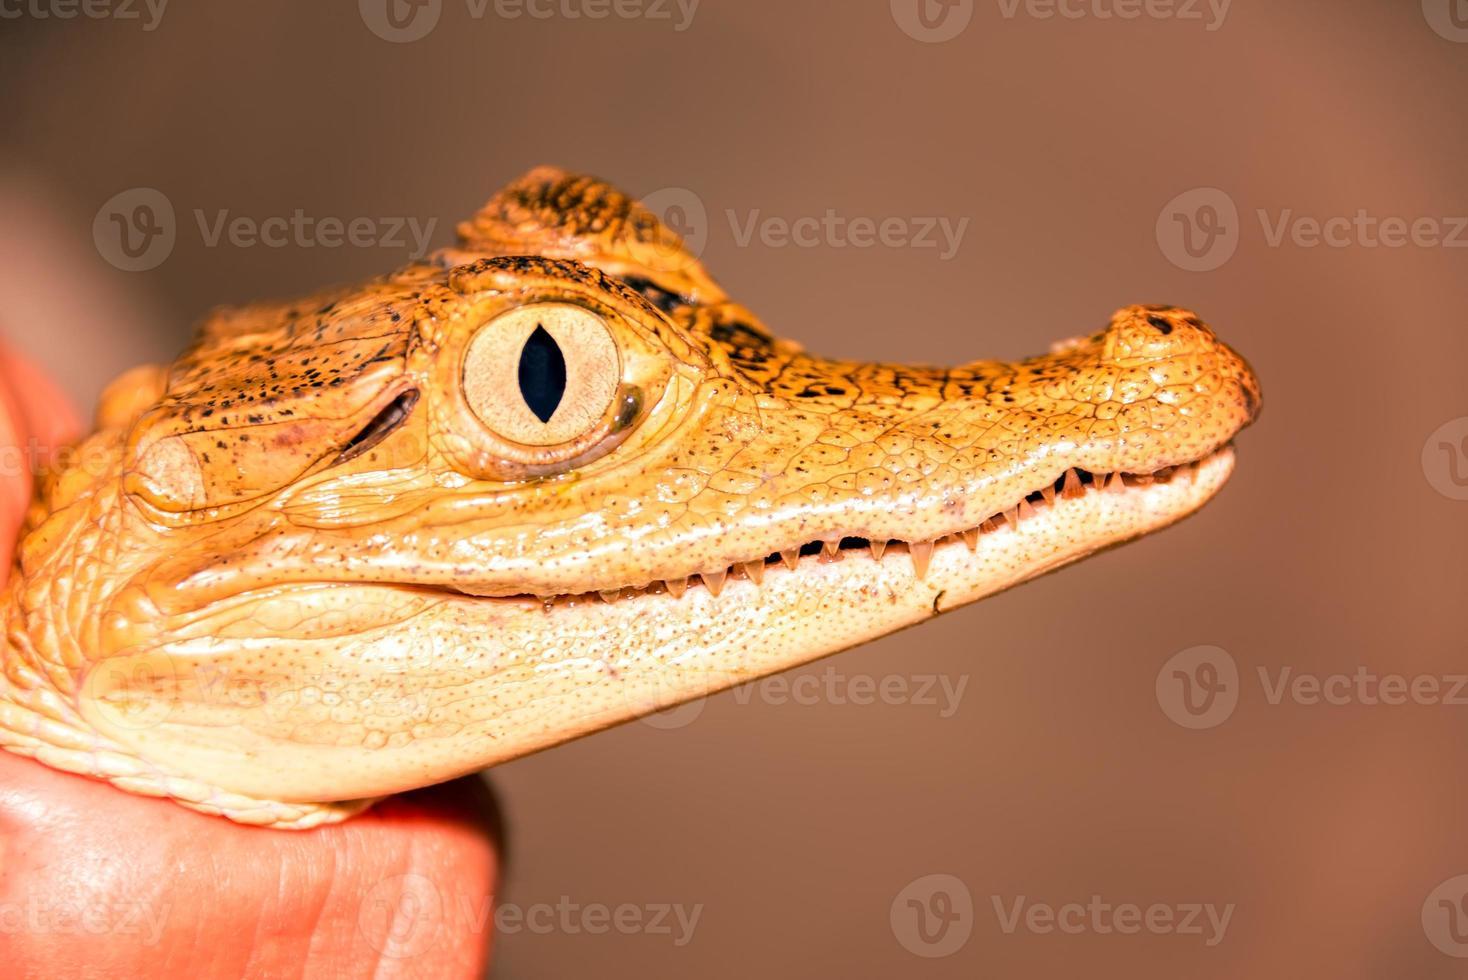 Kaaiman gezicht close-up foto